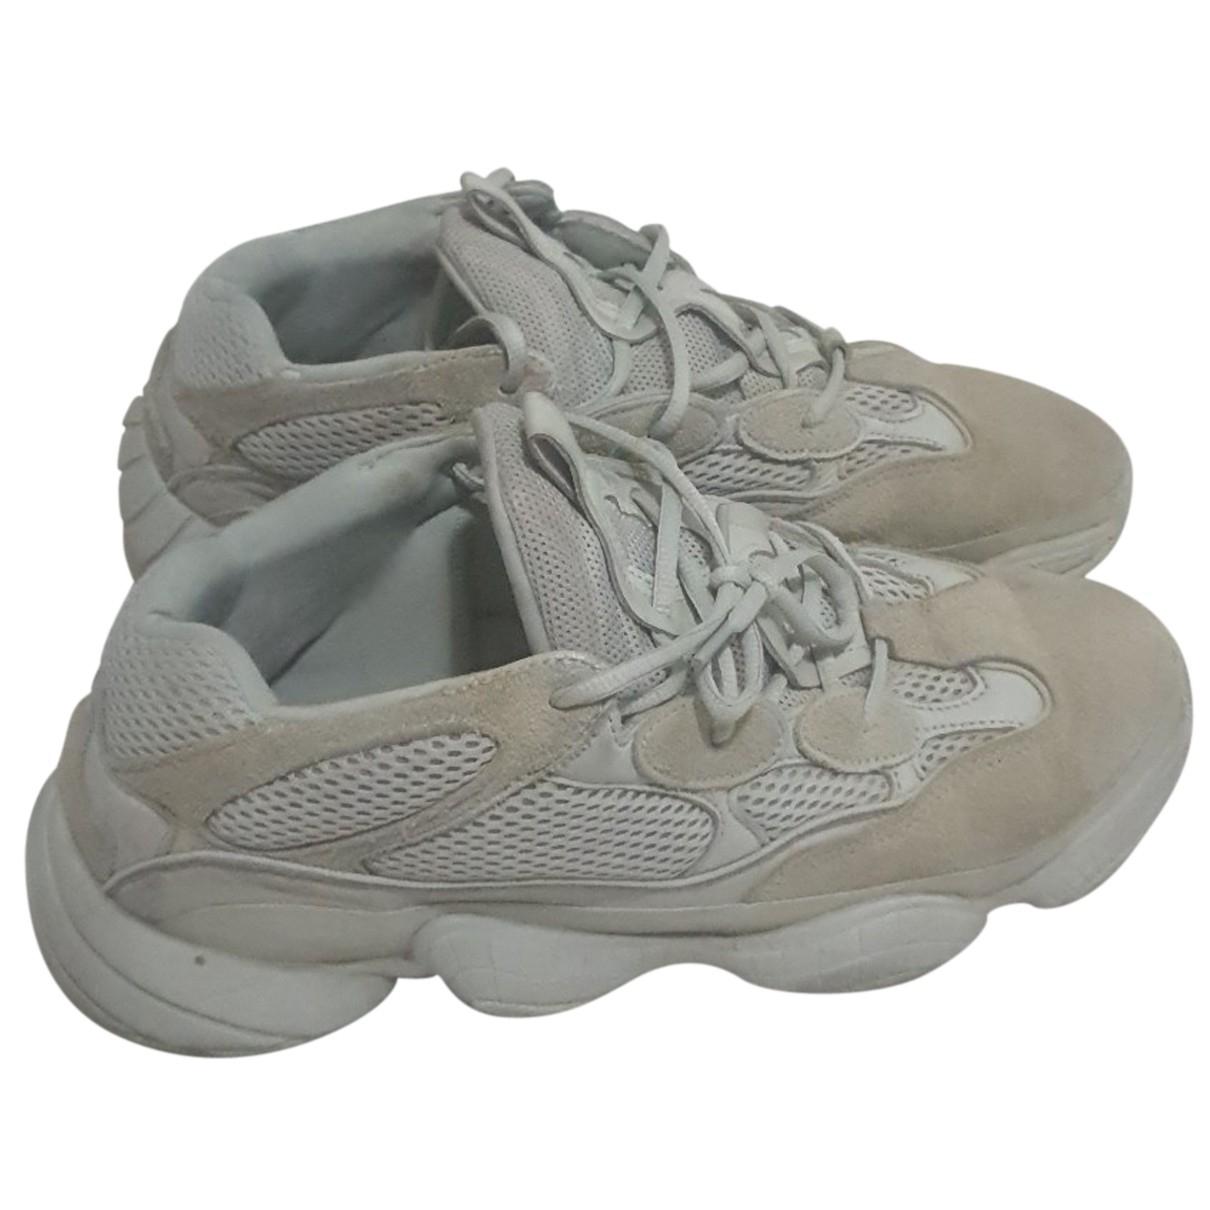 Yeezy X Adidas - Baskets 500 pour homme en suede - beige